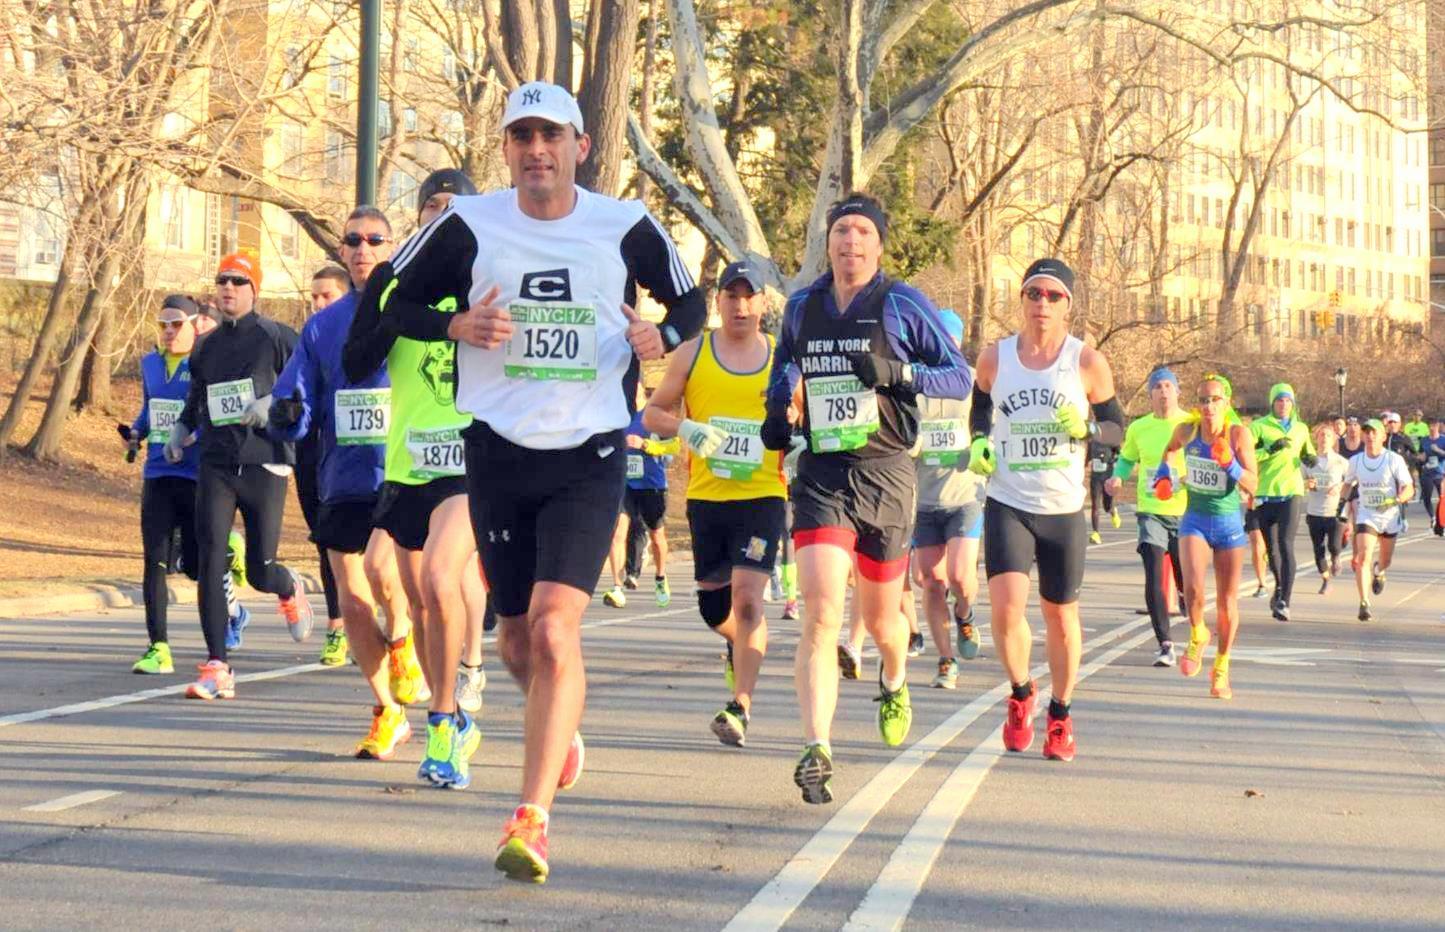 marc-marathon-new-york-1